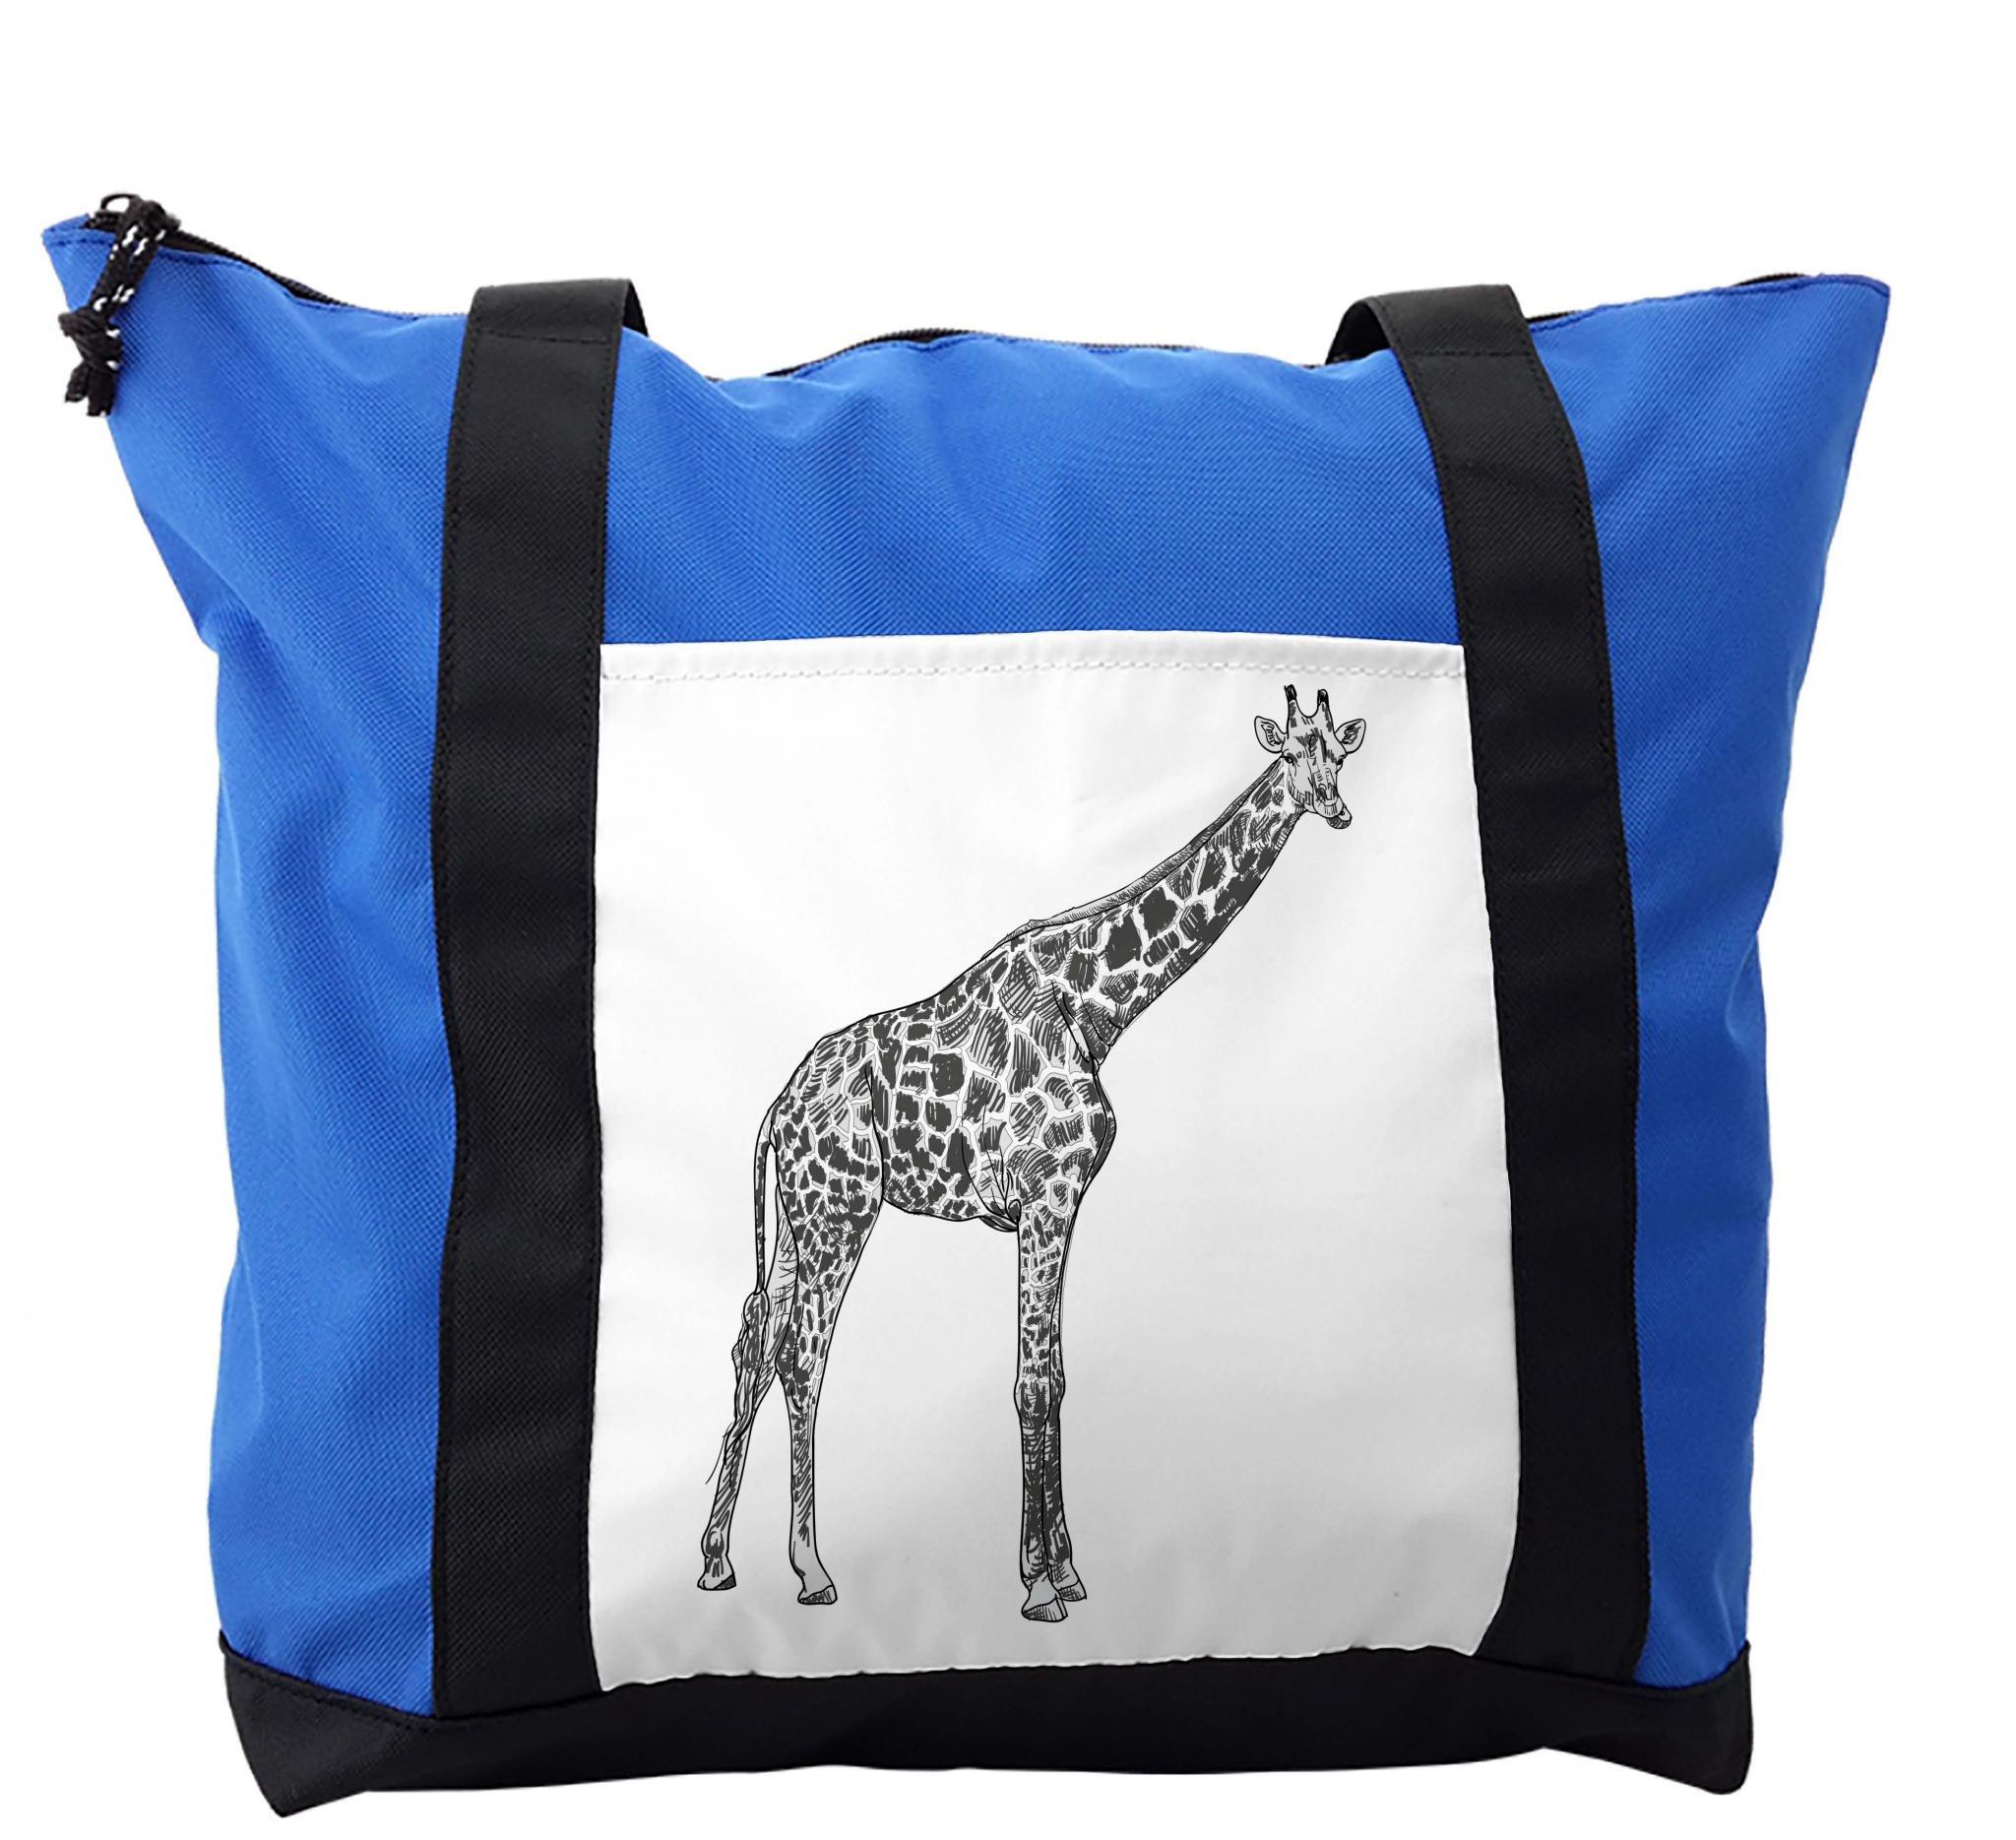 Lunarable Giraffe Shoulder Bag, Animal Spotted Skin Sketch, Durable with Zipper